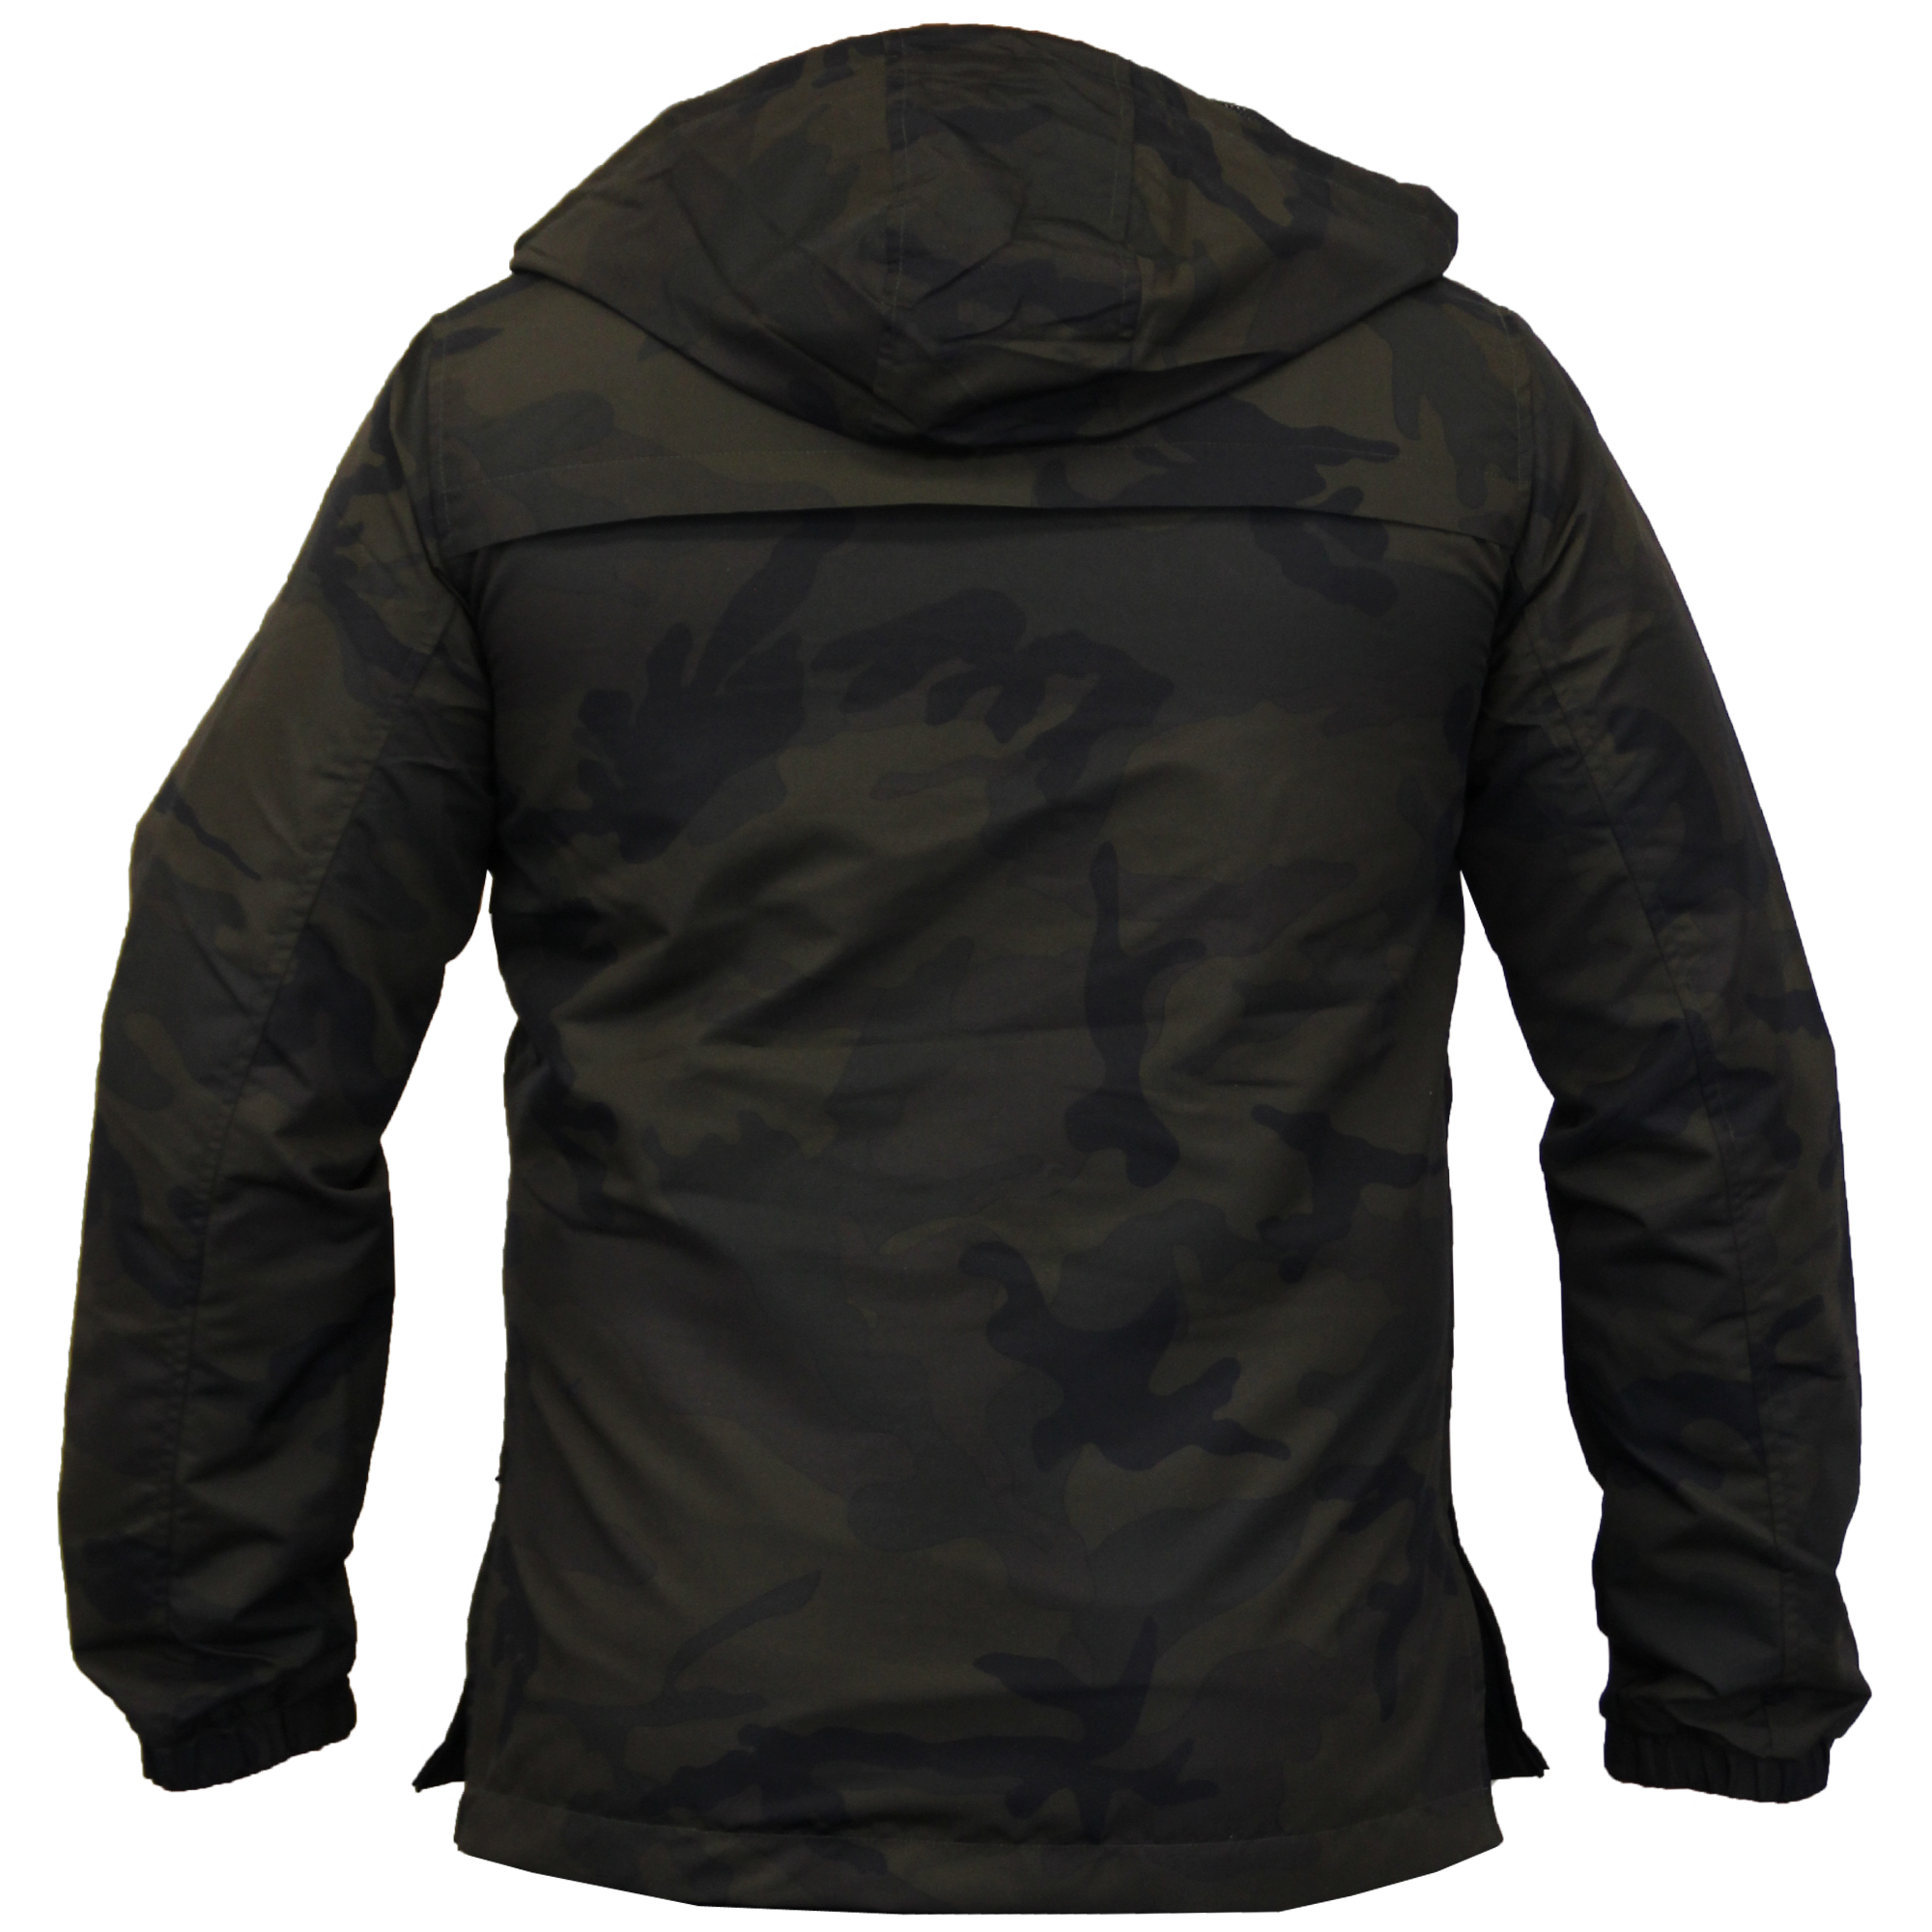 mens camo jacket brave soul windbreaker over the head coat. Black Bedroom Furniture Sets. Home Design Ideas